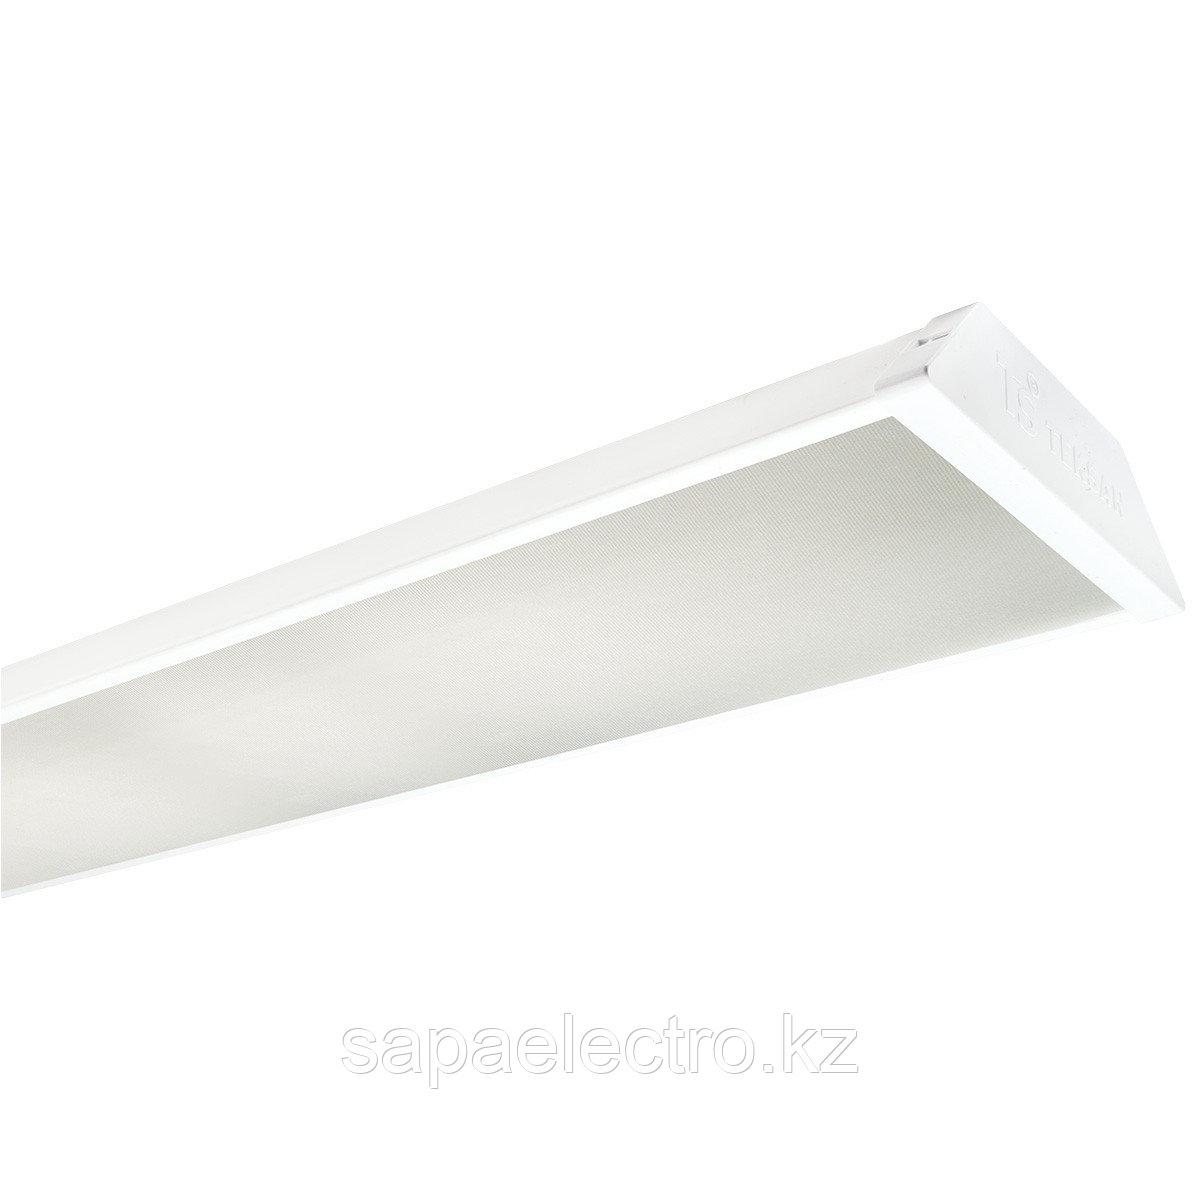 Св-к LEDTUBE LINEAR PINSPOT 2x9W+лампа (60см) IP20